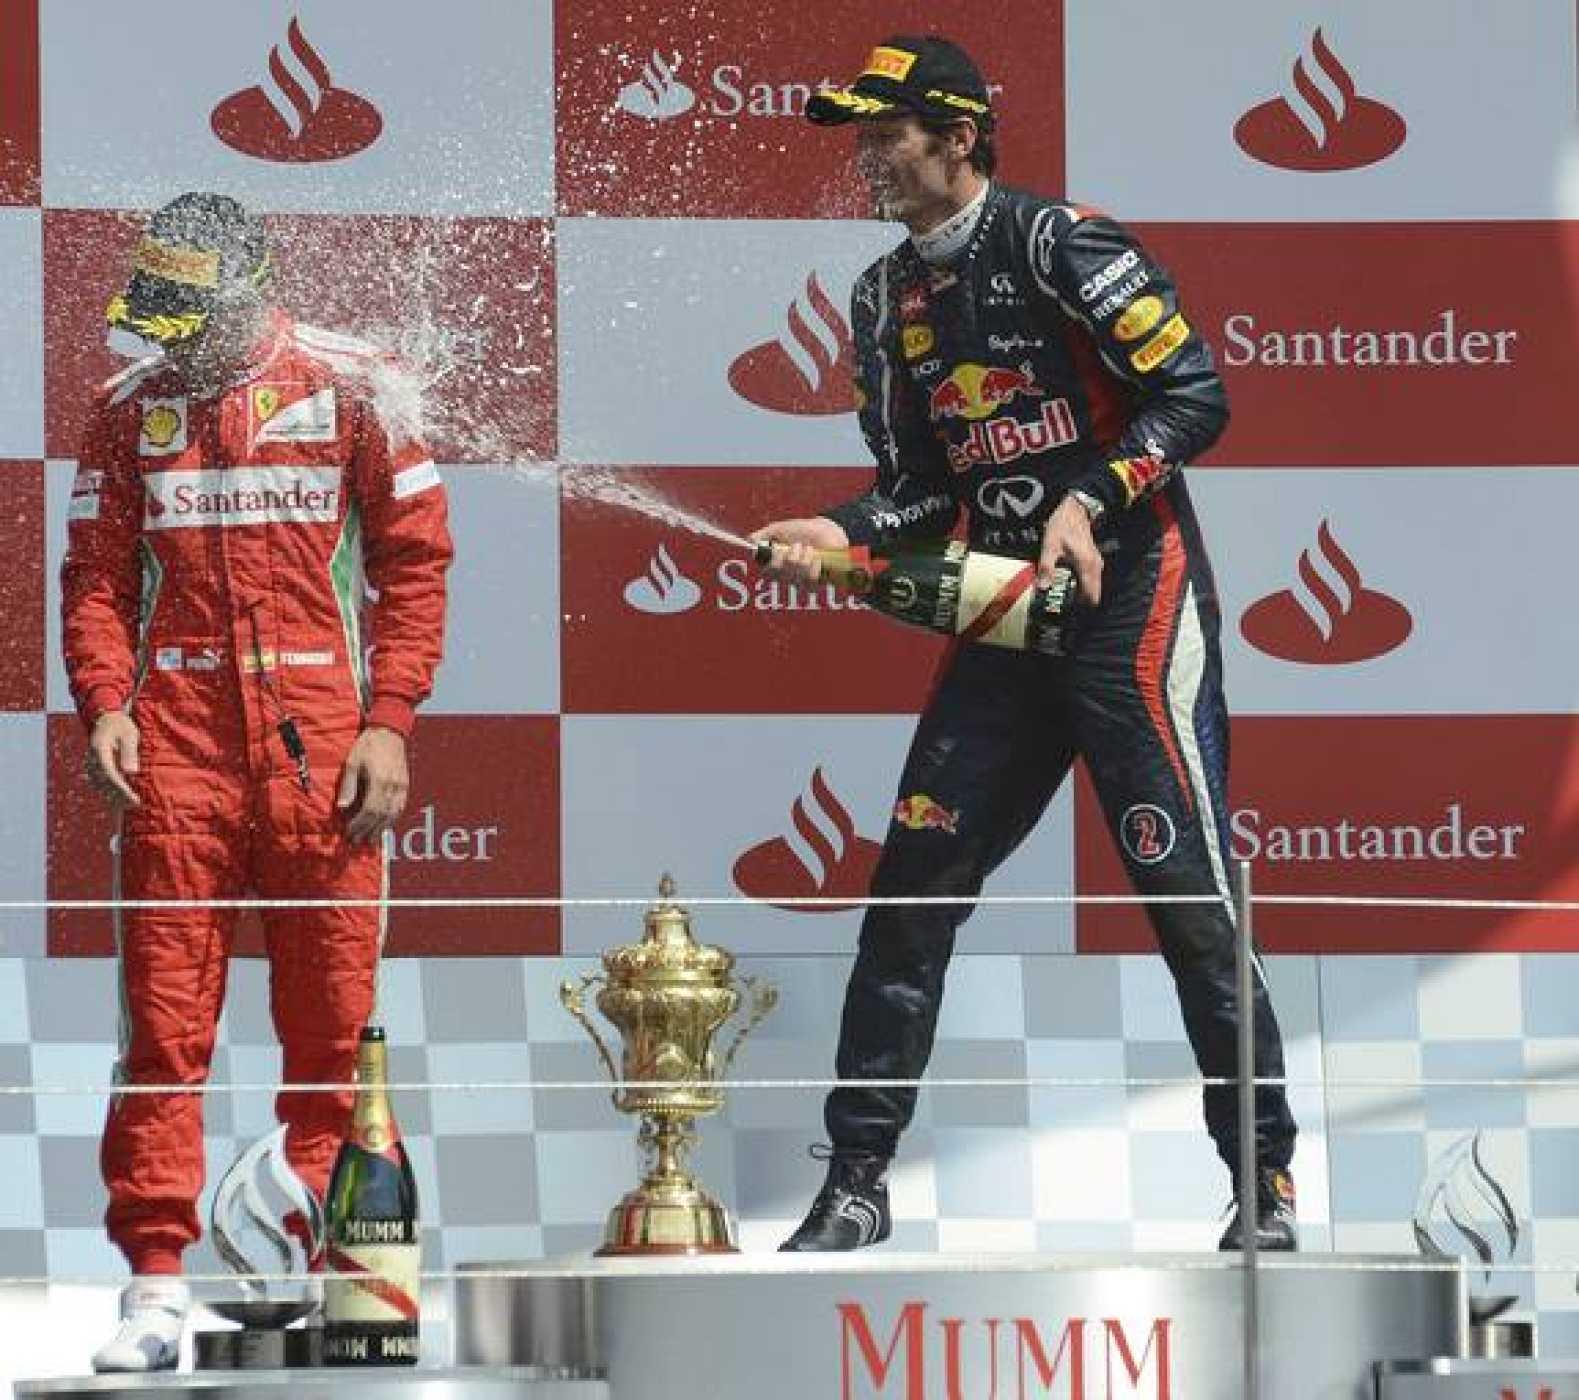 Red Bull Formula One driver Mark Weber of Australia (R) sprays  Ferrari Formula One driver Fernando Alonso after winning the British F1 Grand Prix at Silverstone, central England